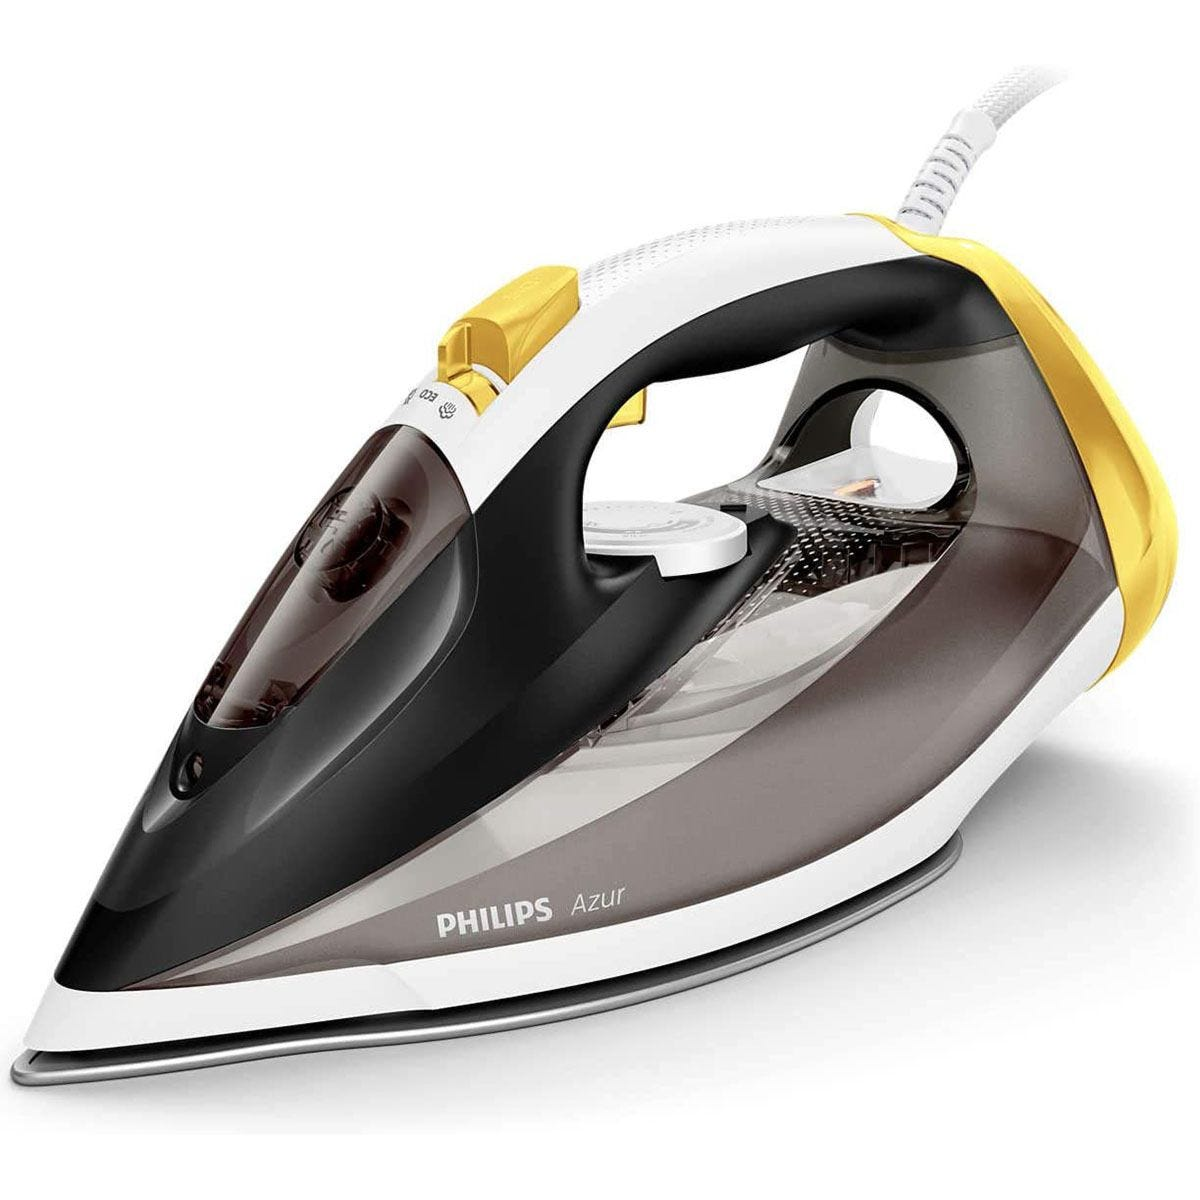 Philips GC4537/86 Azur 2400W Steam Iron - Black/Yellow/White